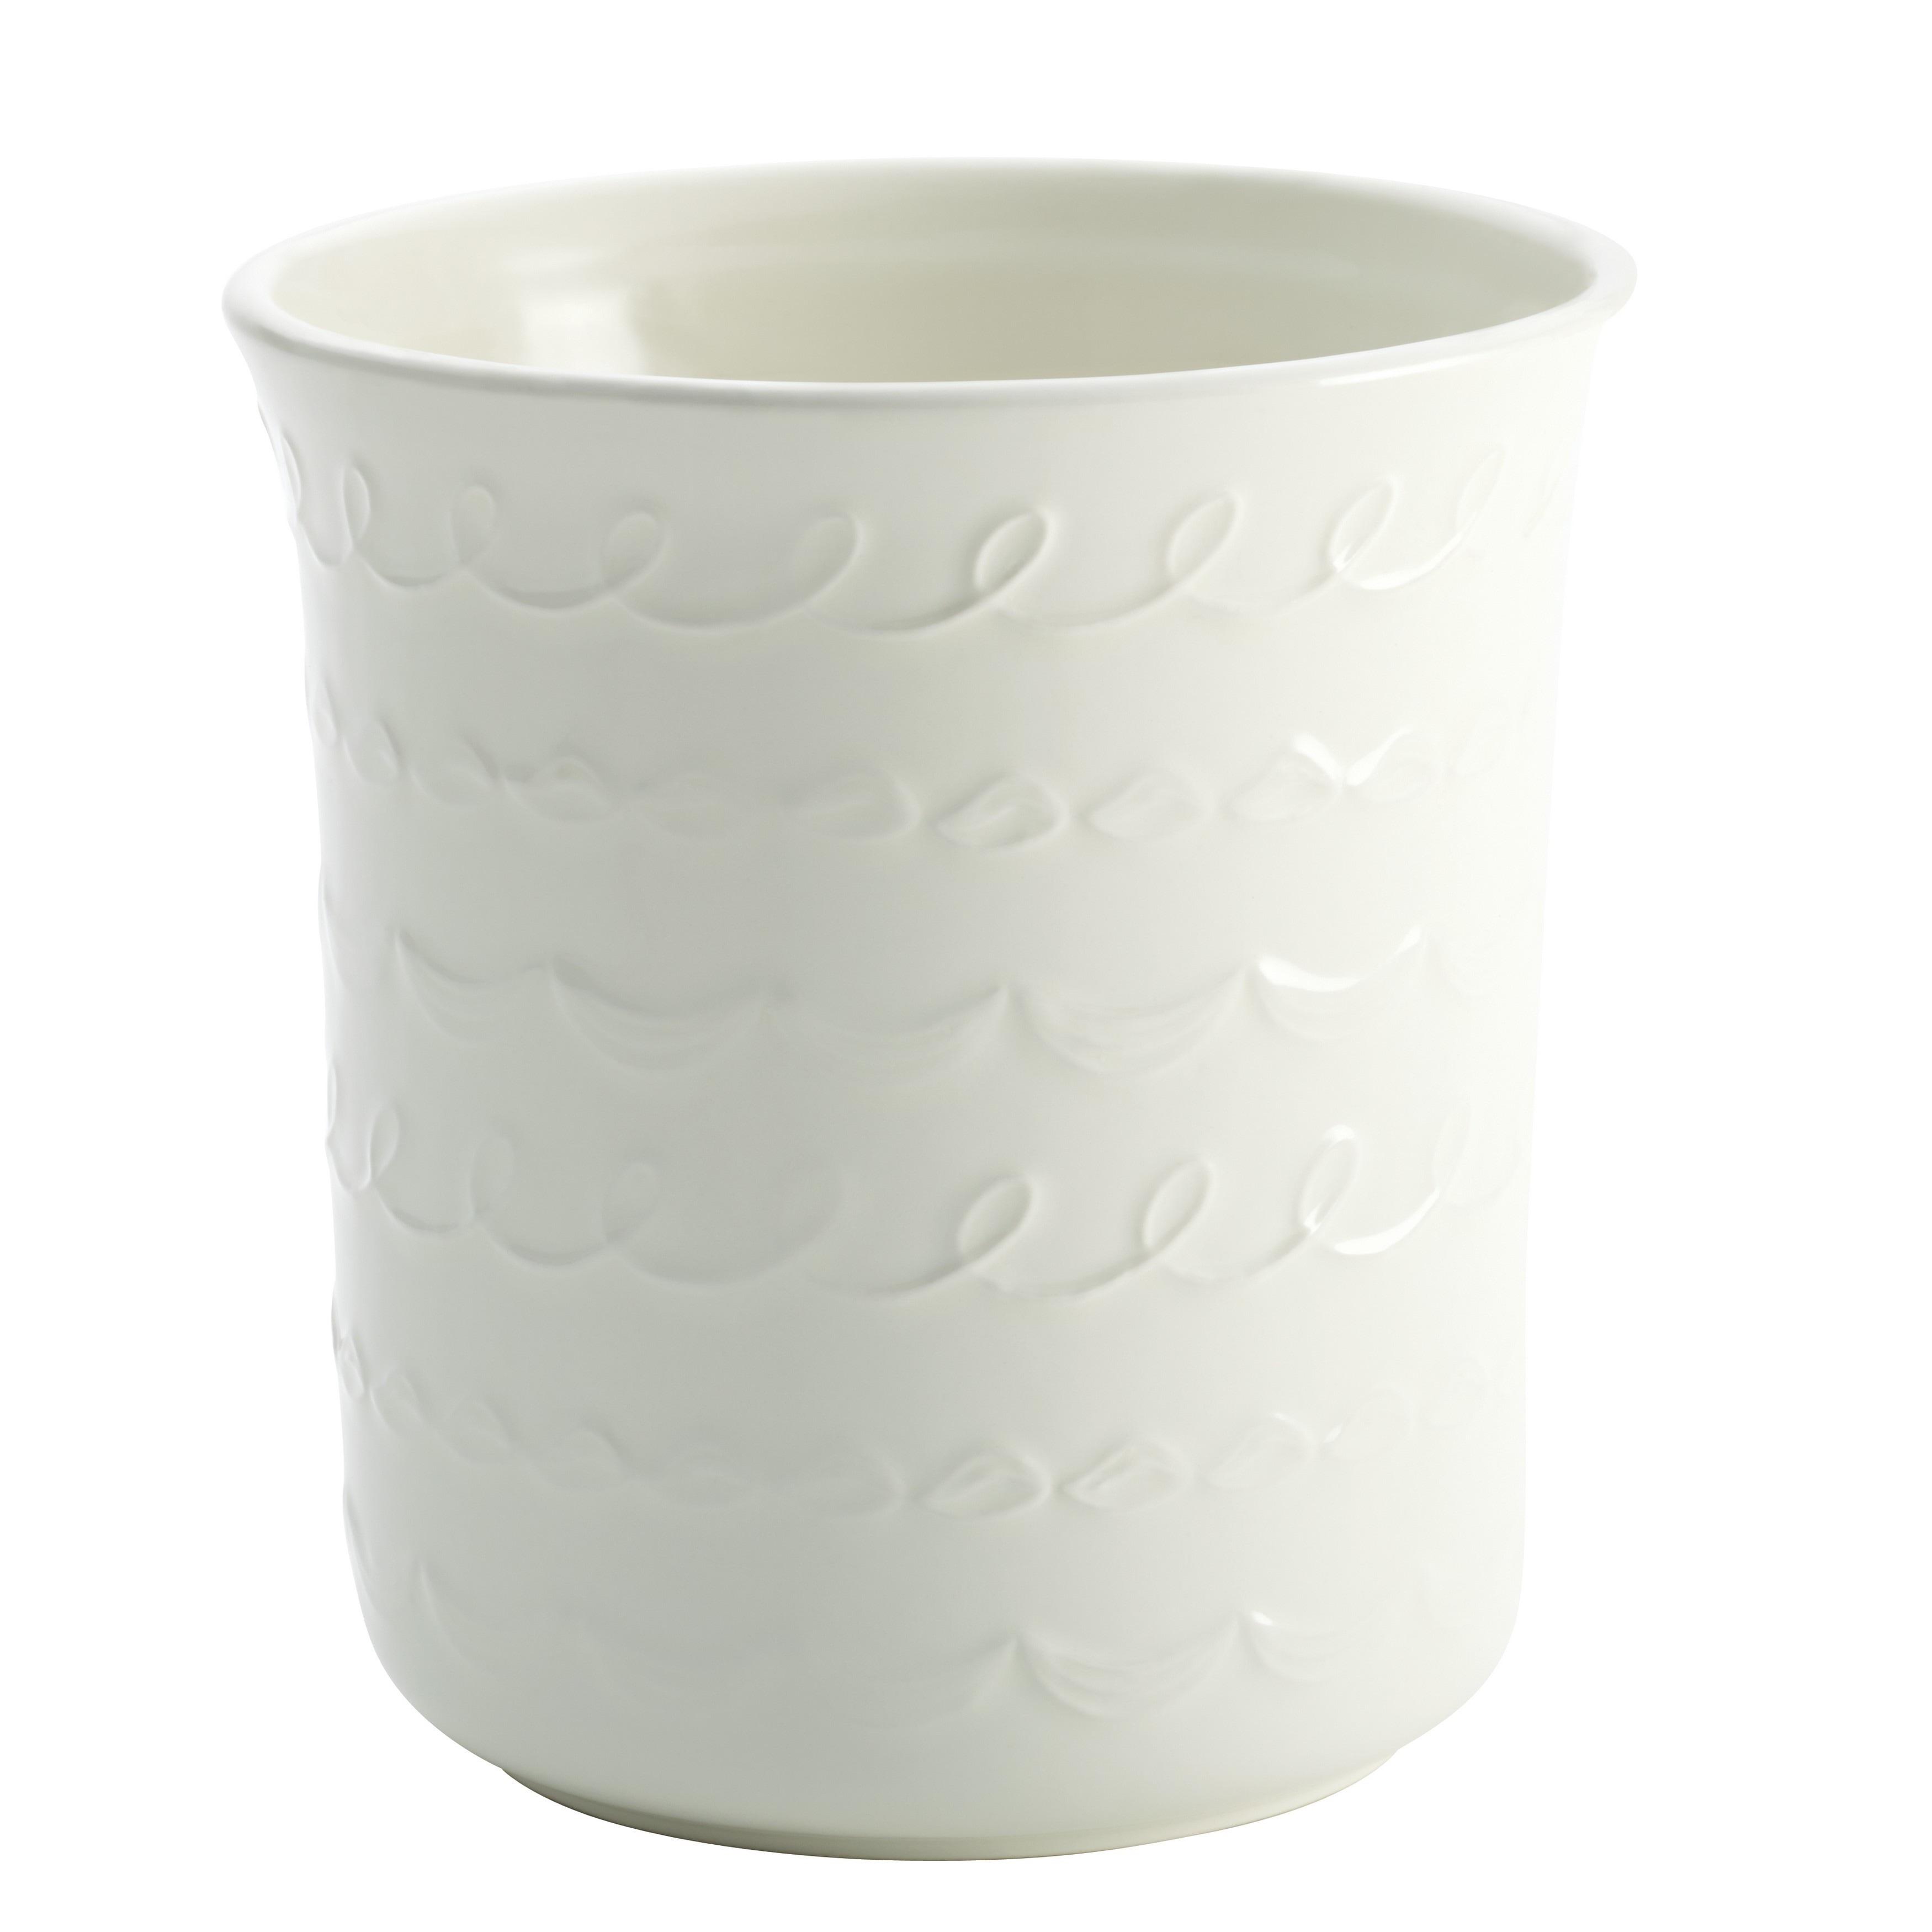 Cake Boss Countertop Accessories Stoneware White 'Icing' ...